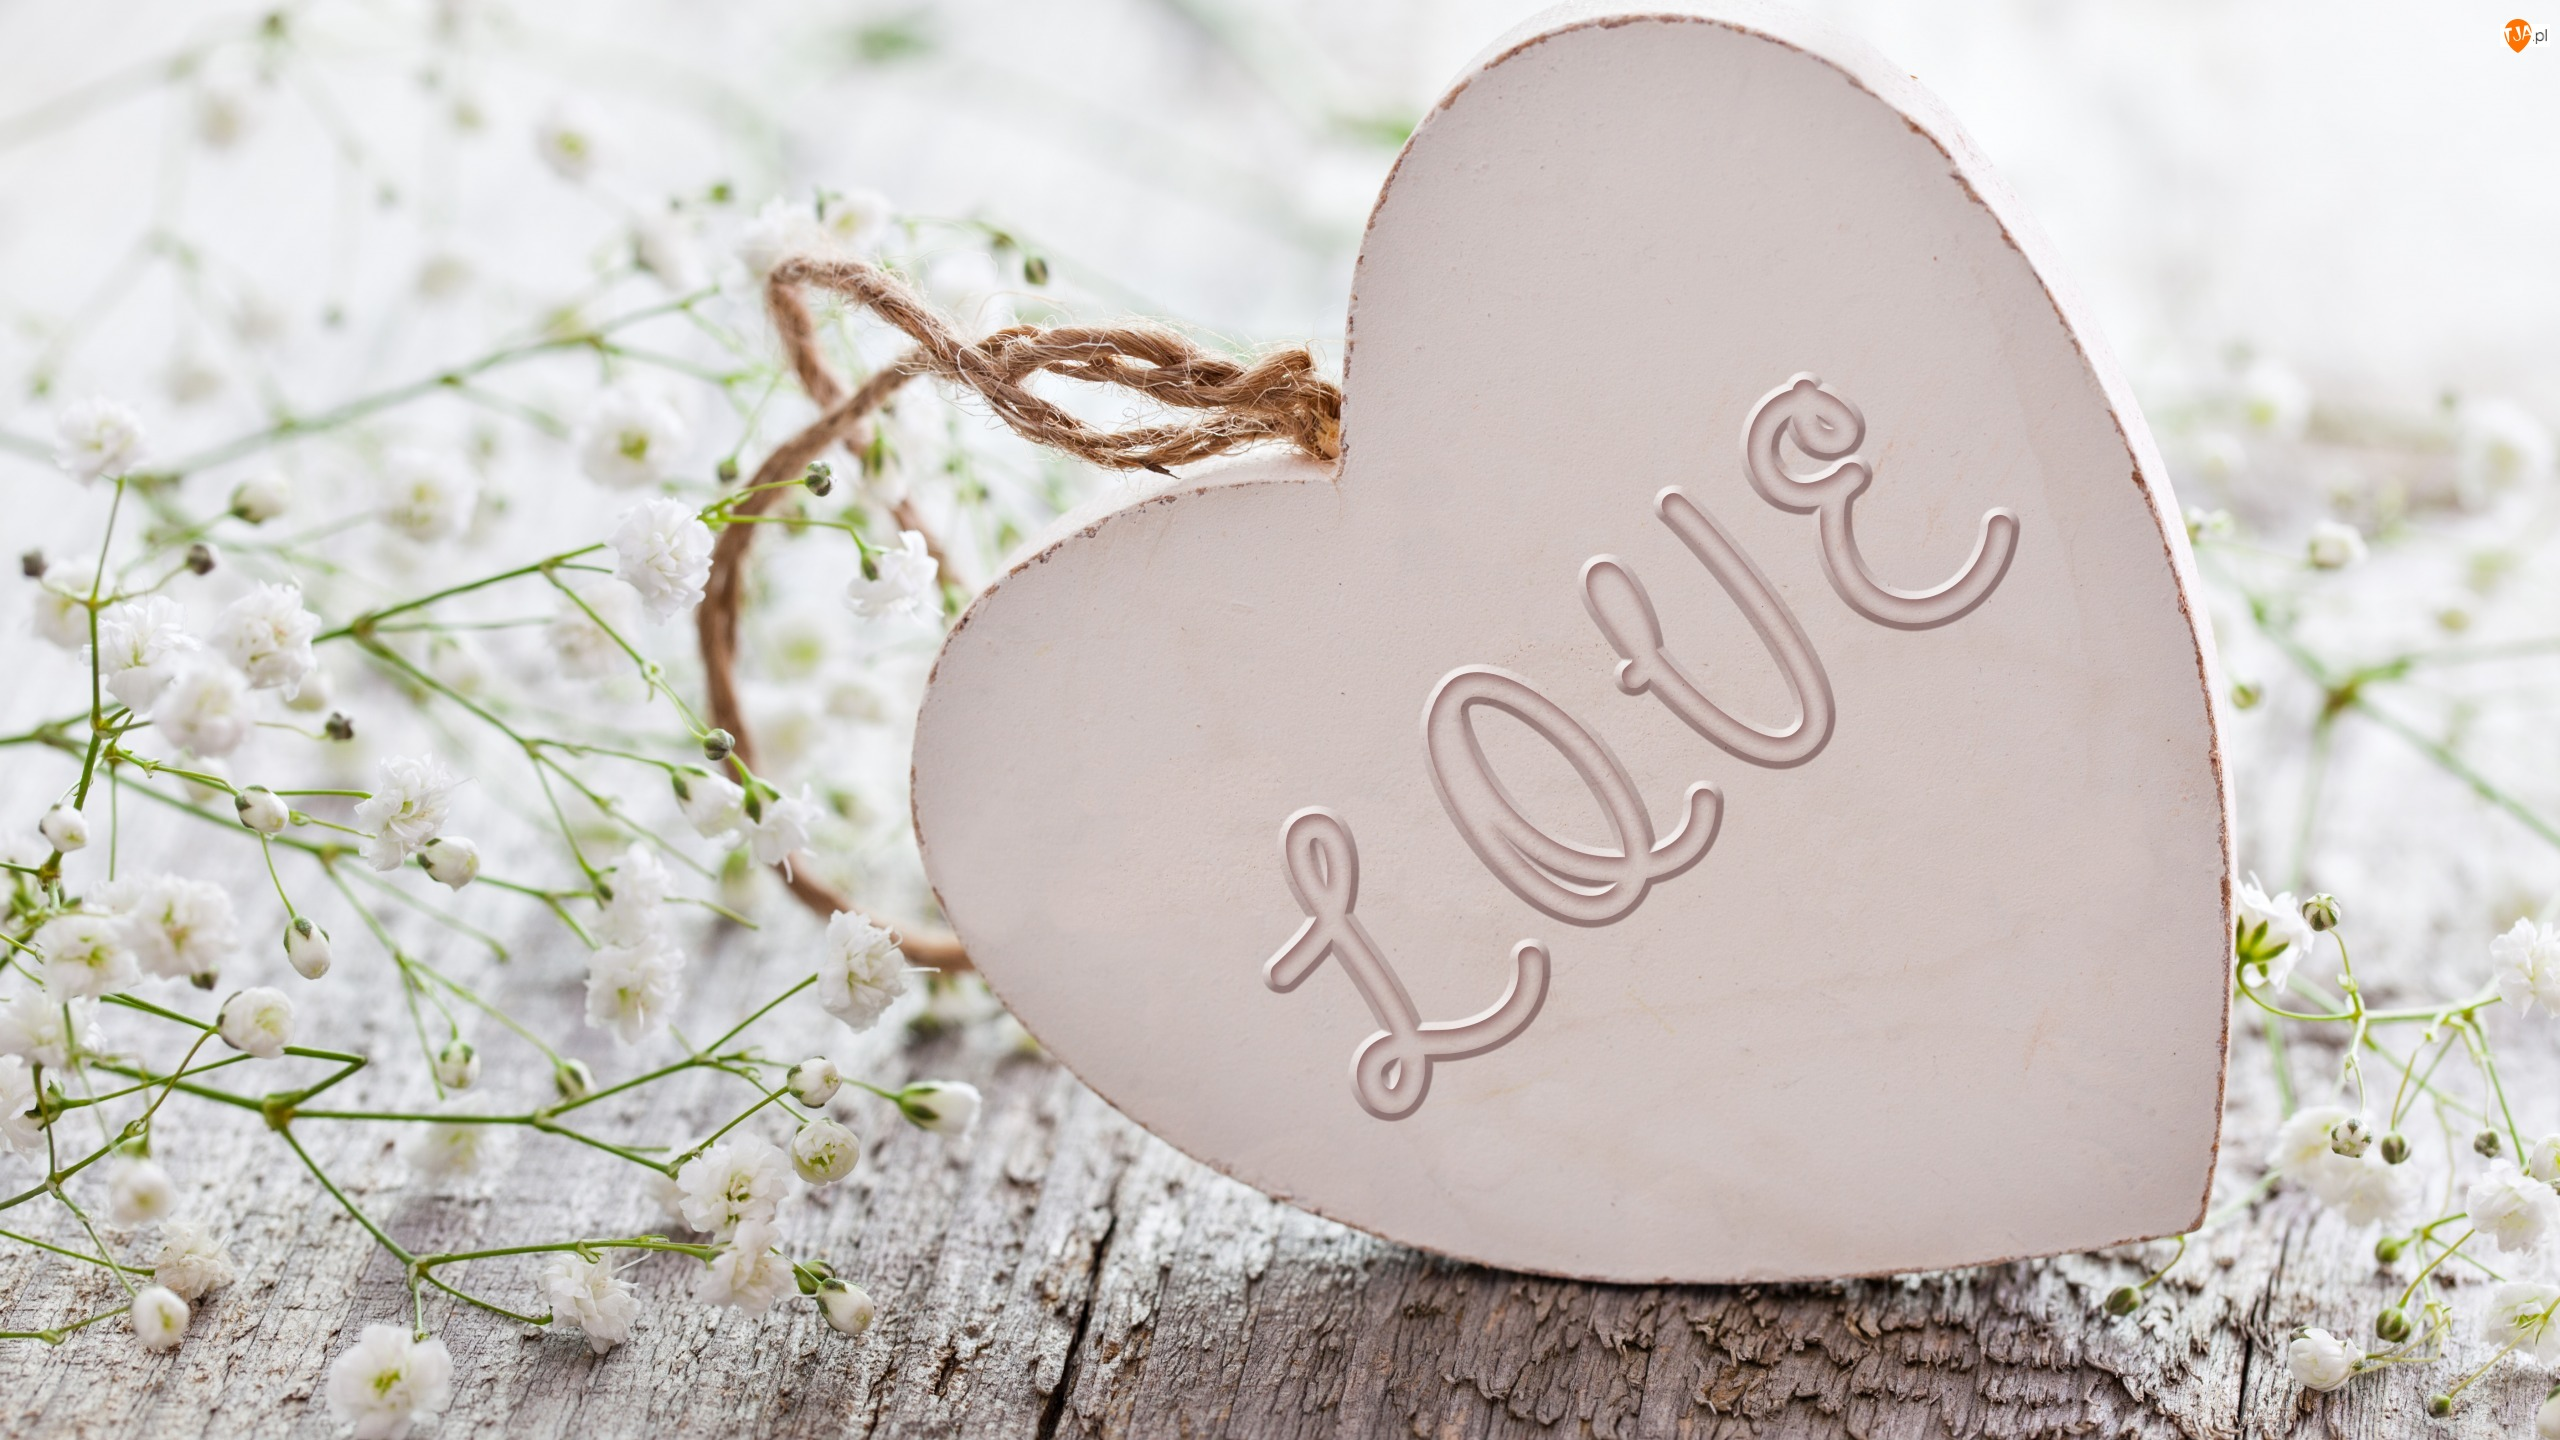 Gipsówka, Serce, Love, Napis, Kwiaty